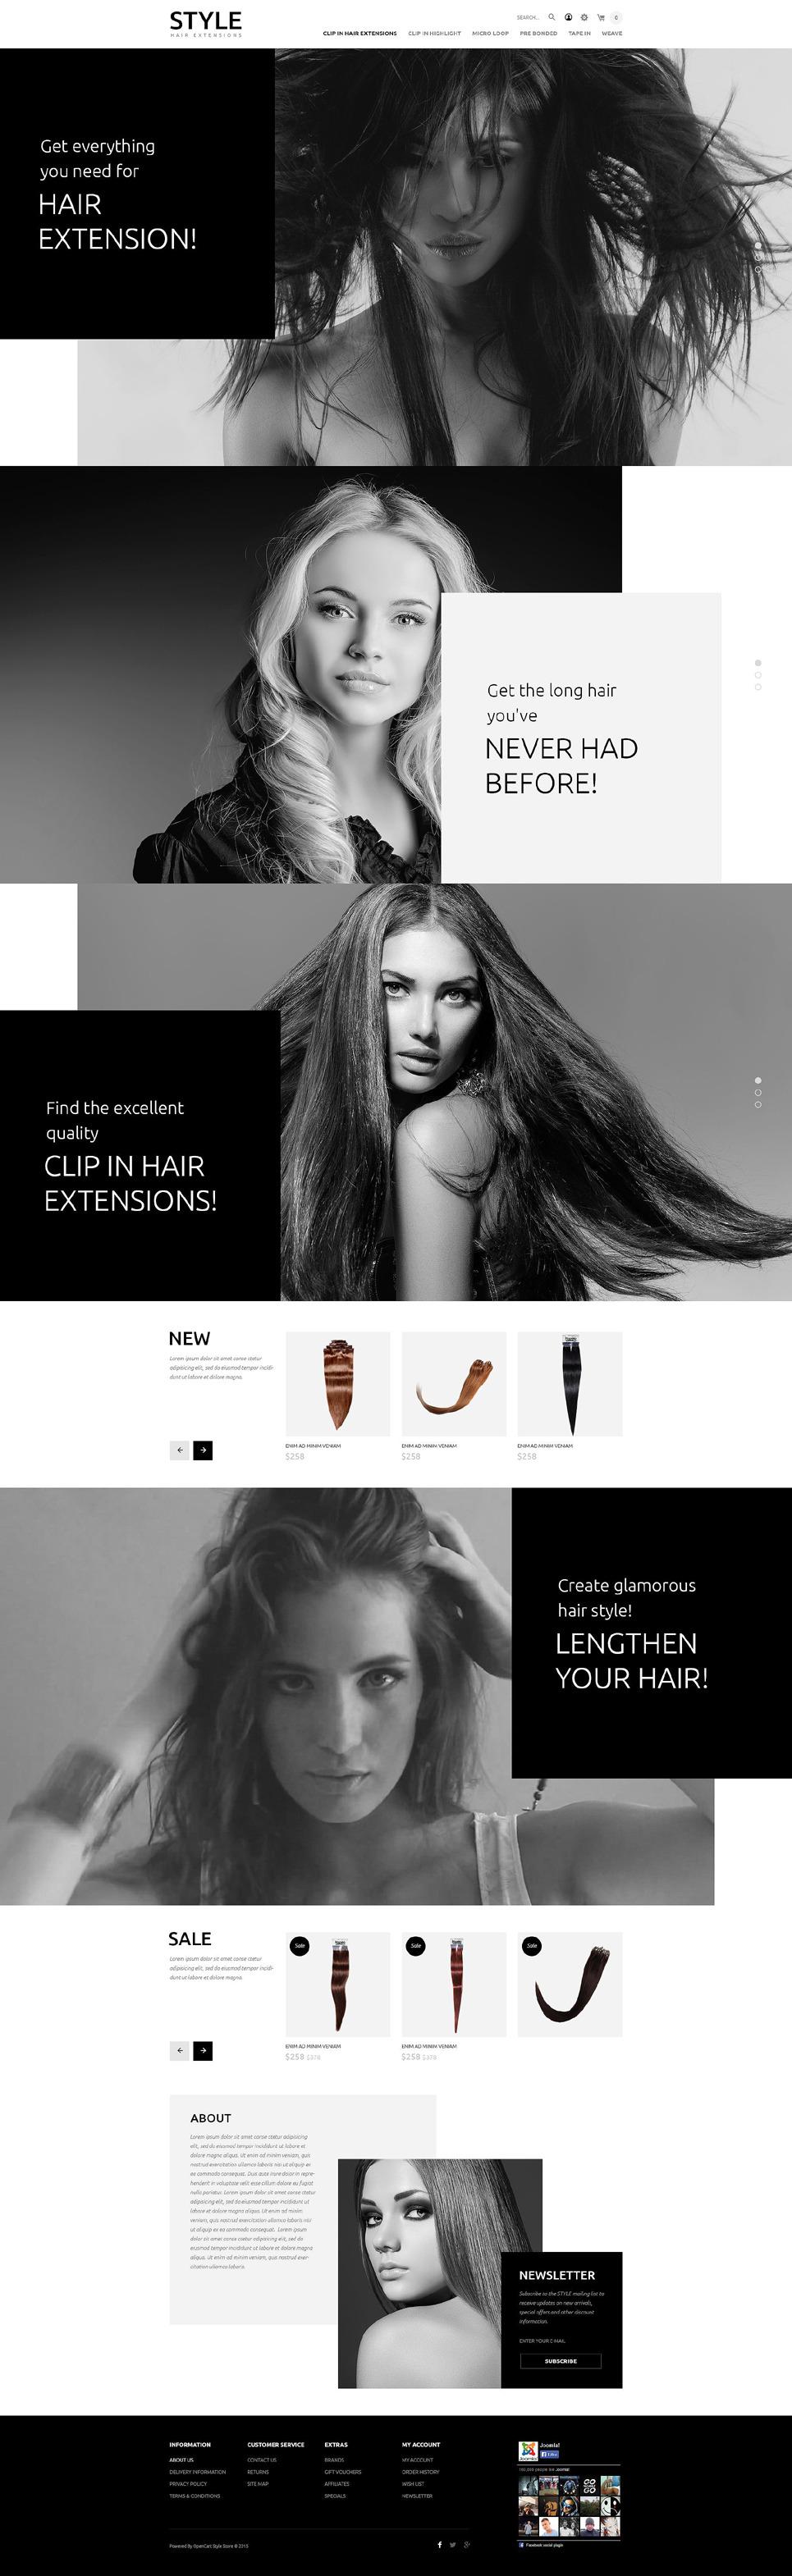 Hair and Beauty Salon OpenCart Template New Screenshots BIG